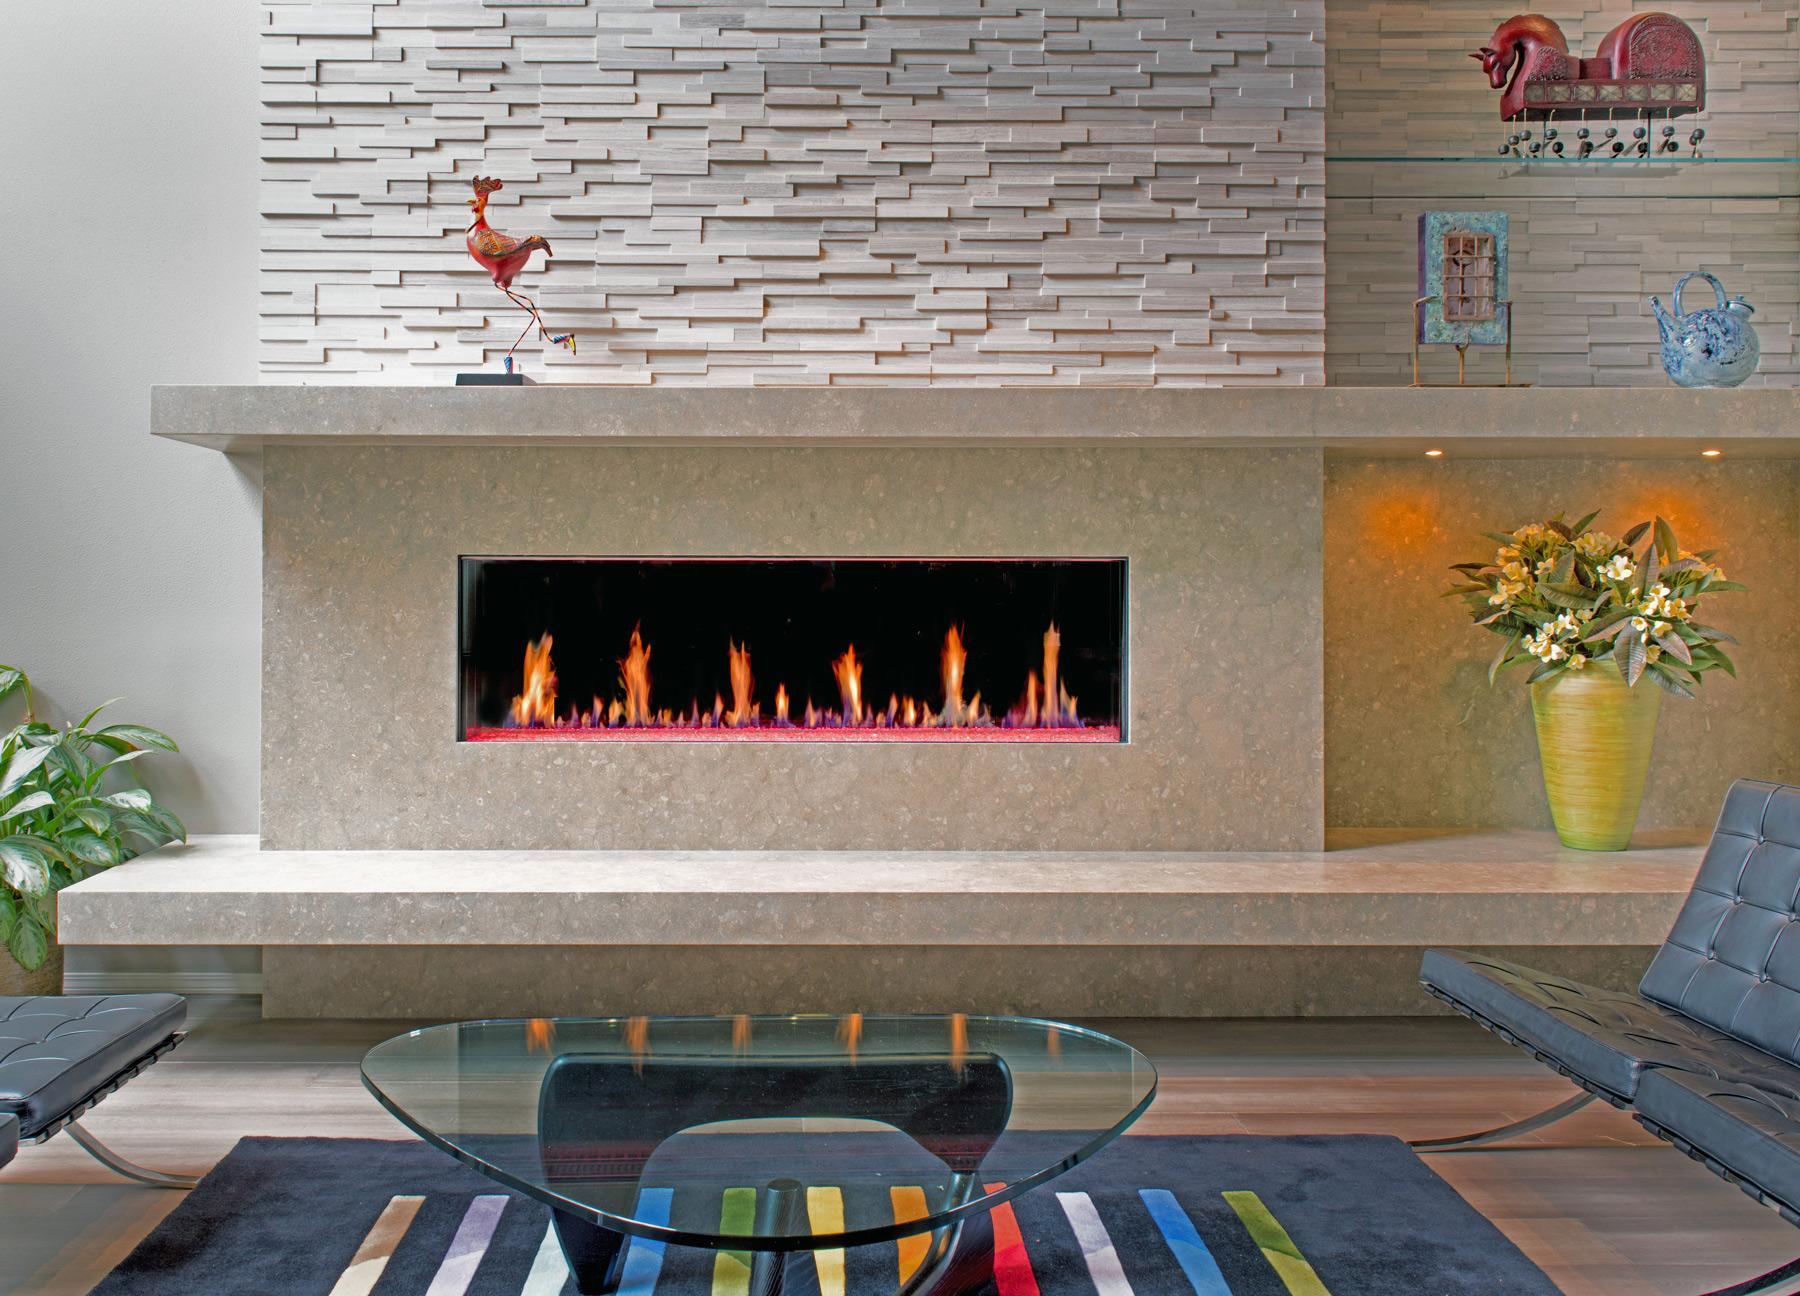 bright indoor custom fireplace set into wall